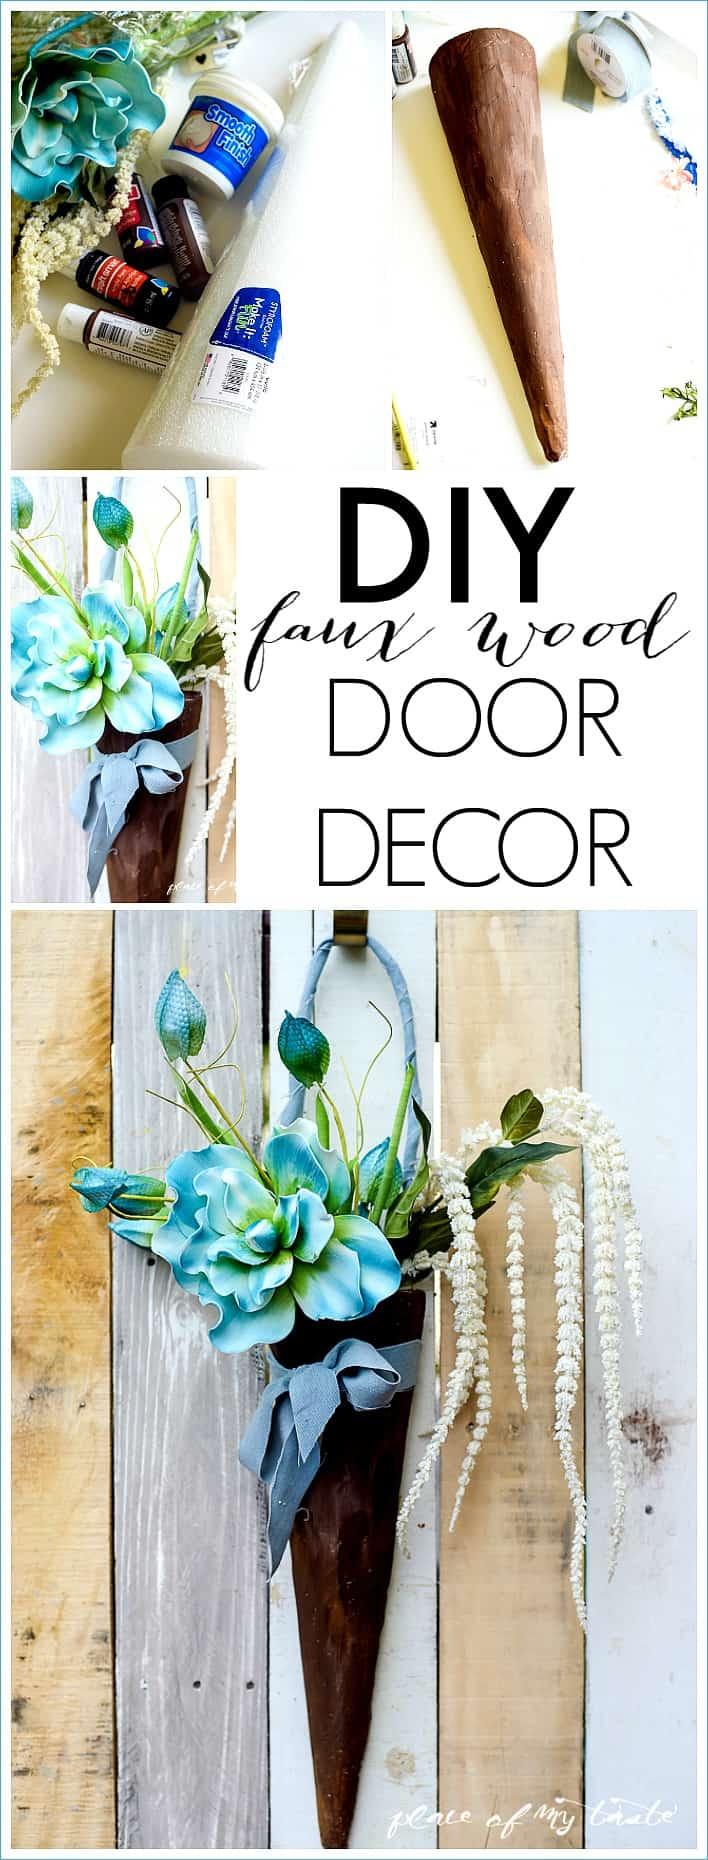 diy faux wood door decor-placeofmytaste.com